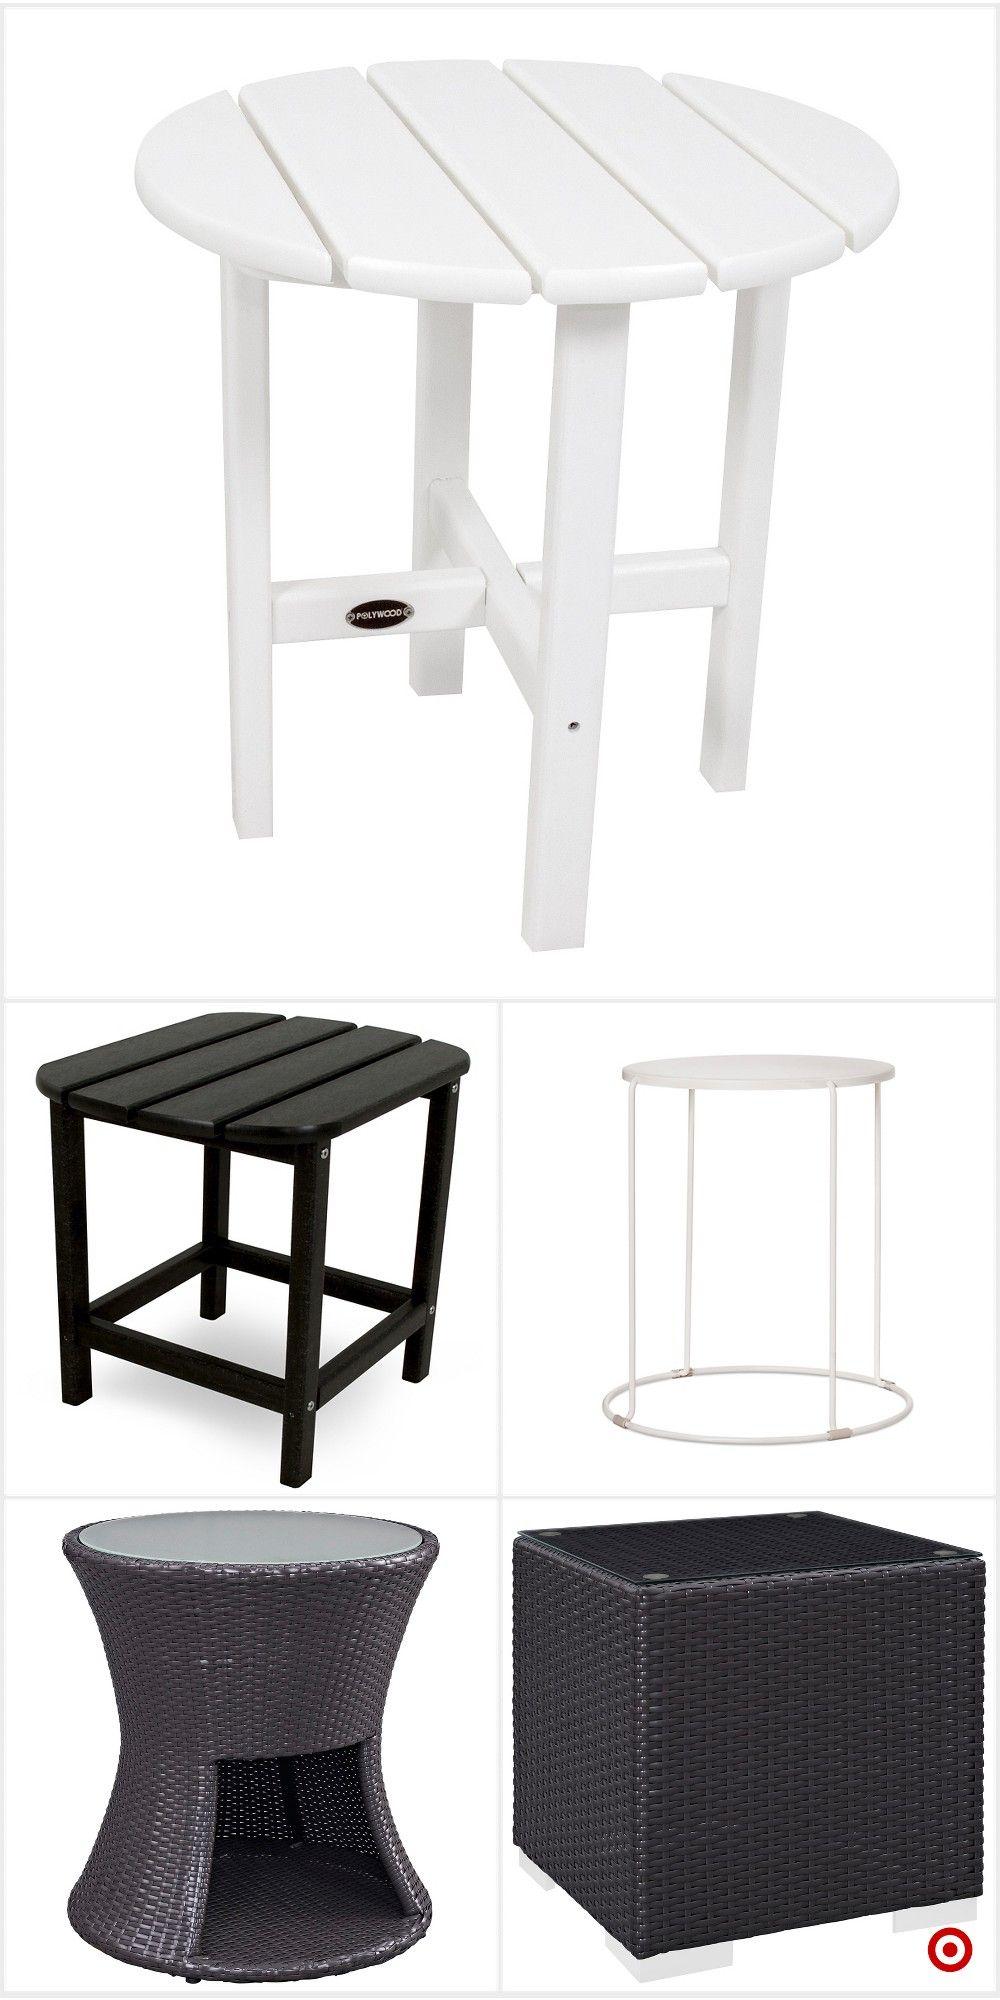 8a0d453de987dccc522e466ee4da30ad Top Result 50 Luxury Black and White Coffee Table Image 2017 Shdy7